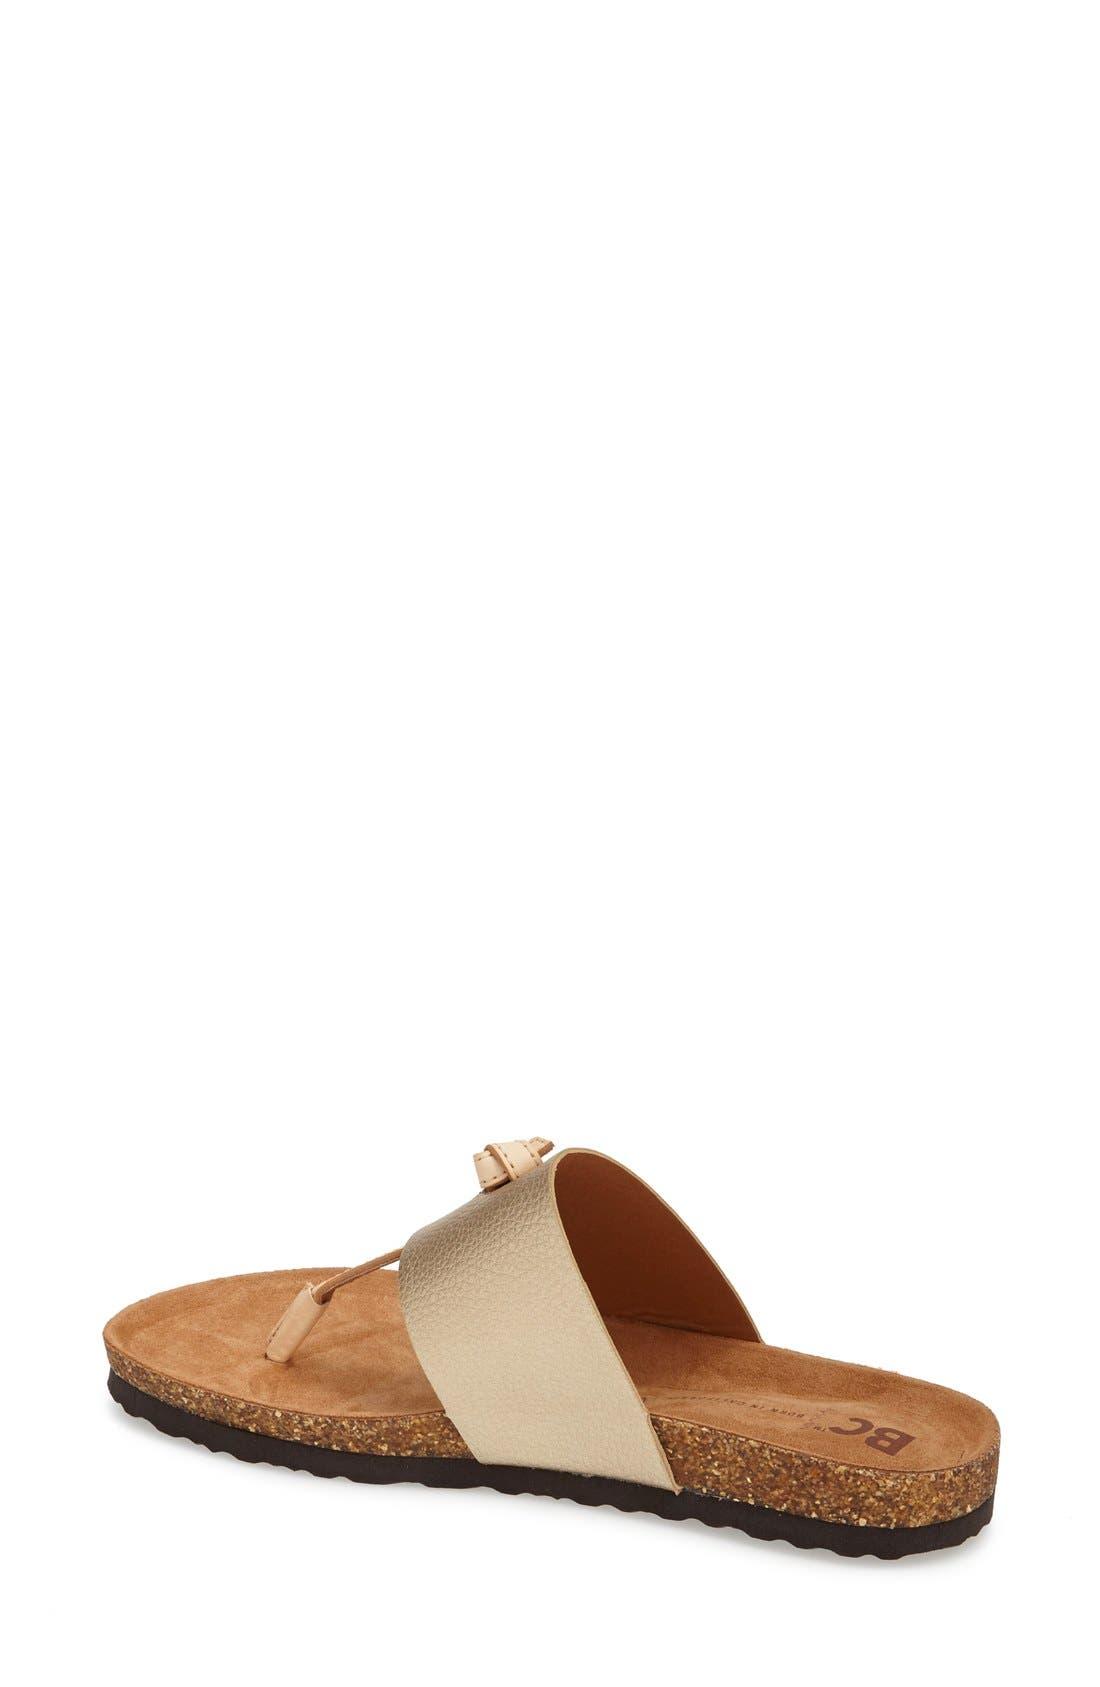 Alternate Image 2  - BC Footwear 'Lynx' Faux Leather Thong Sandal (Women)